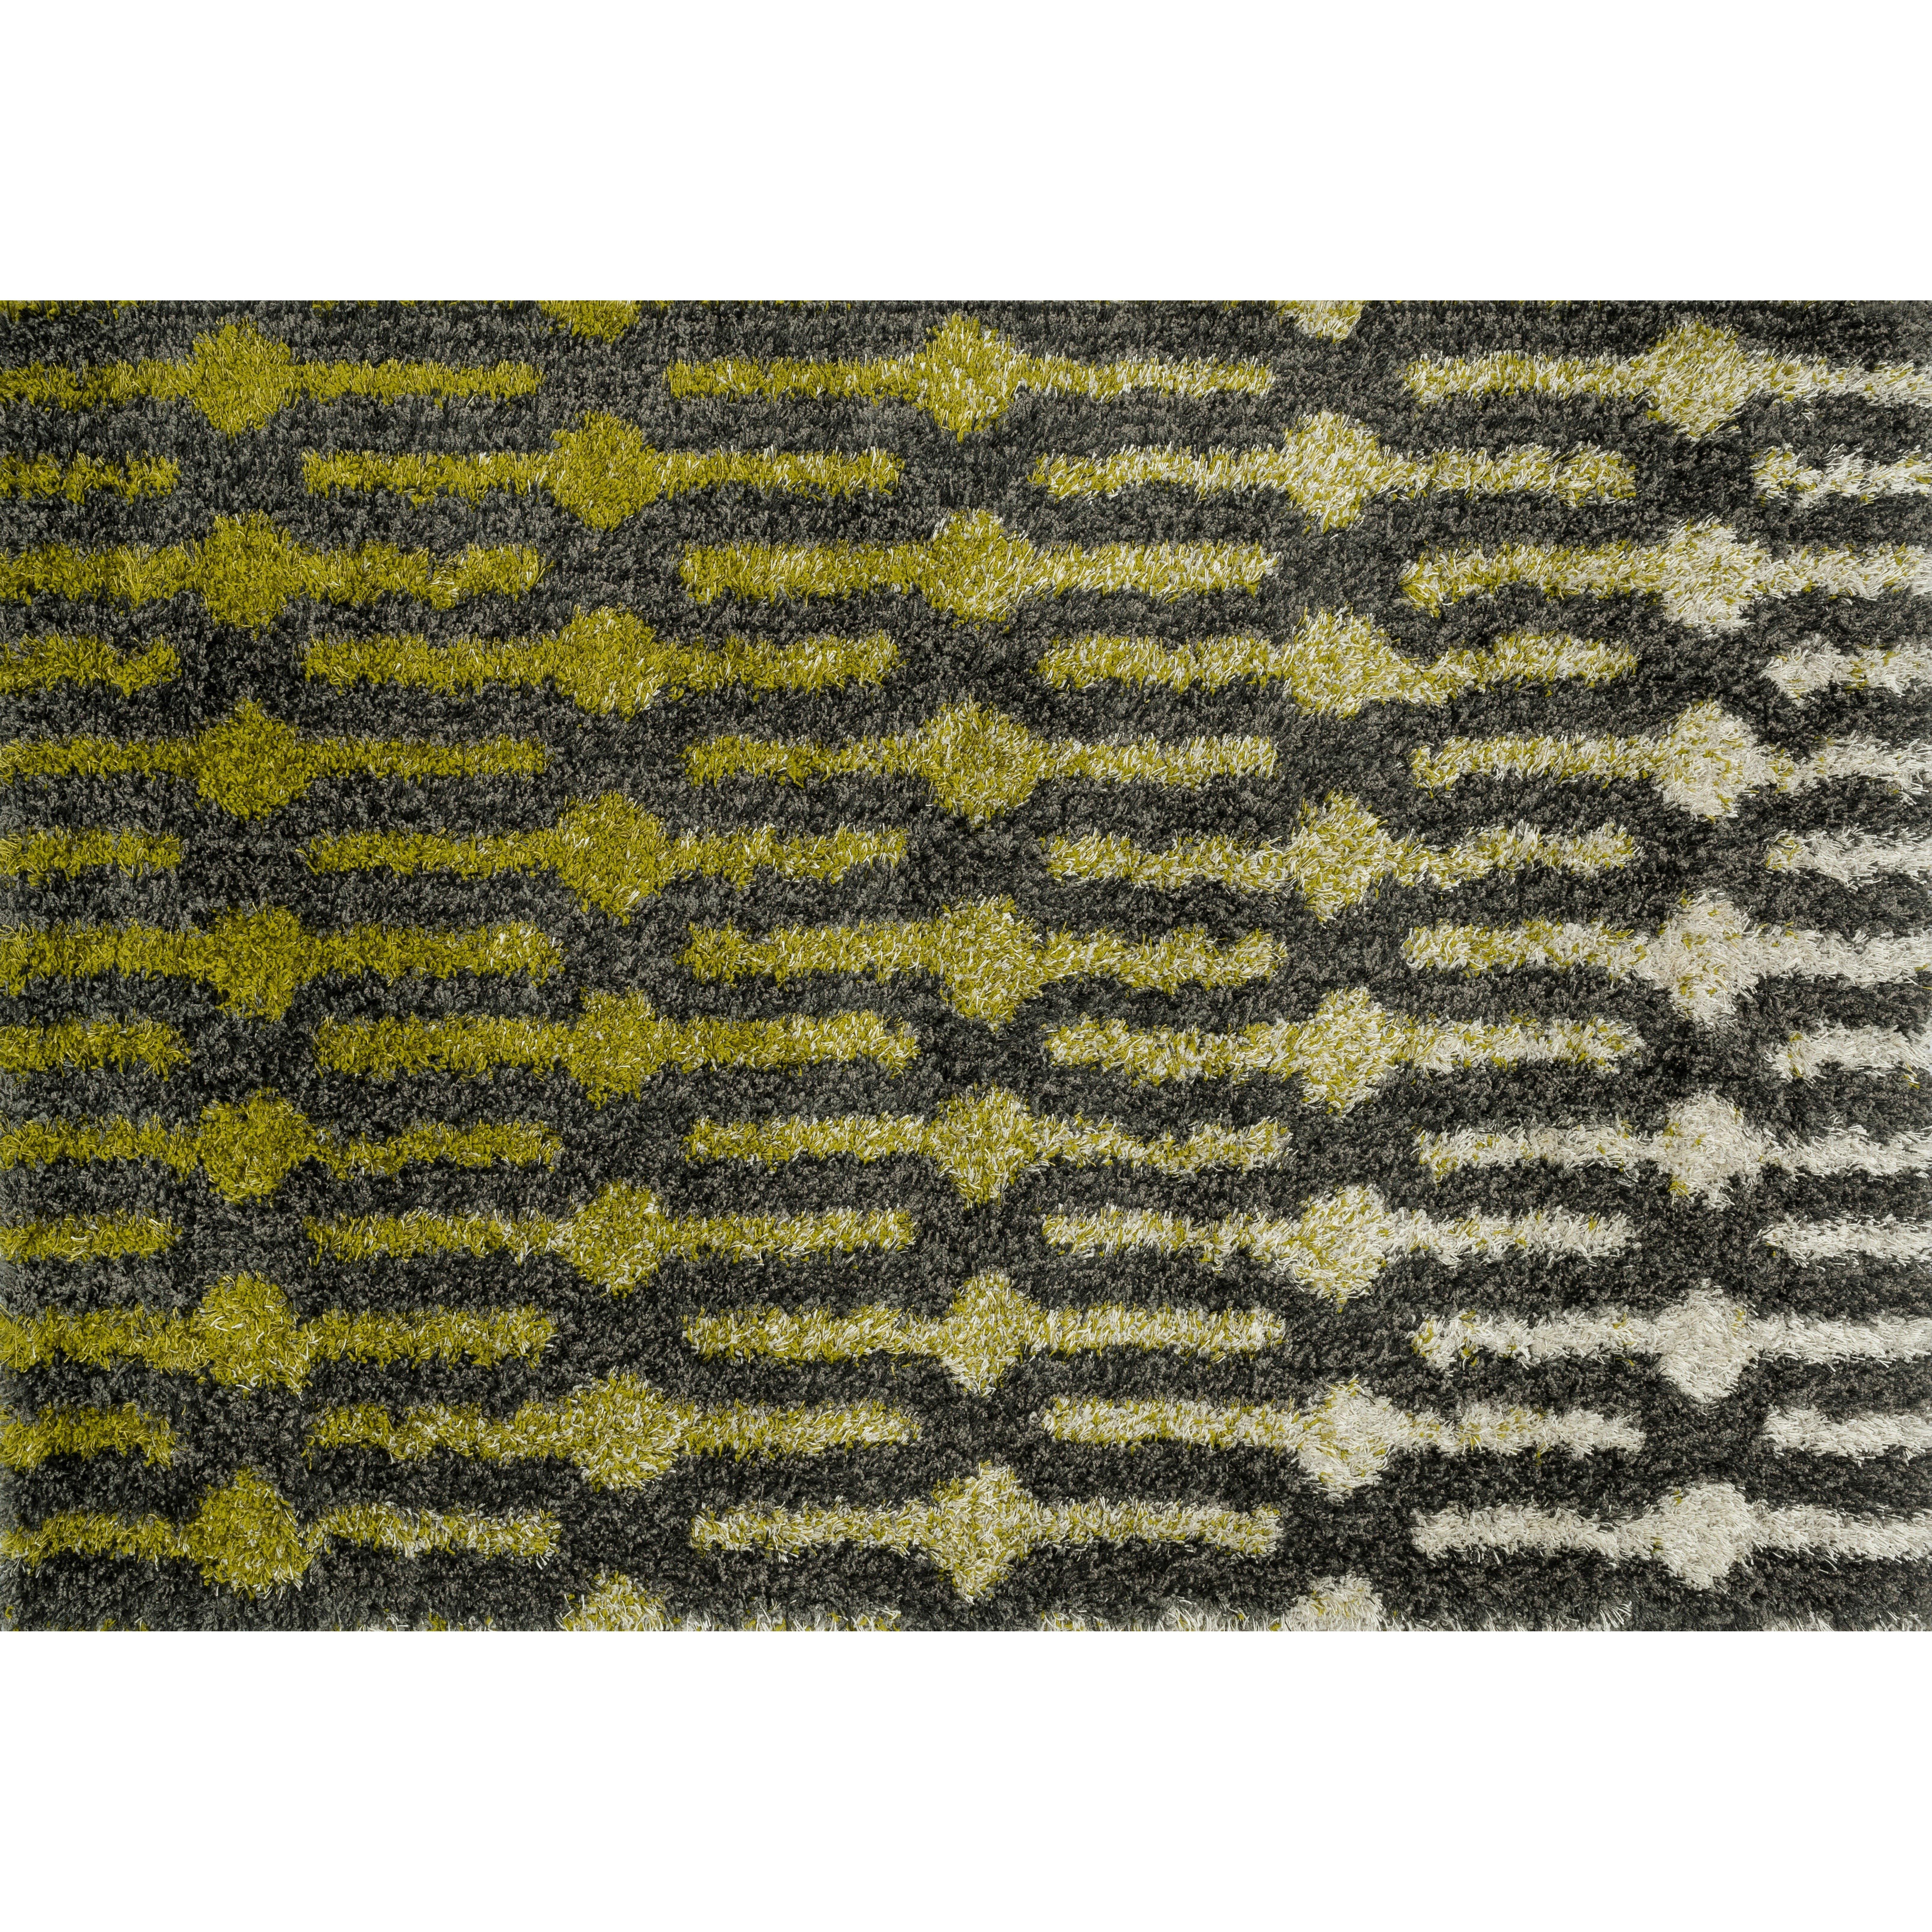 Loloi Rugs Cosma Green/Grey Rug